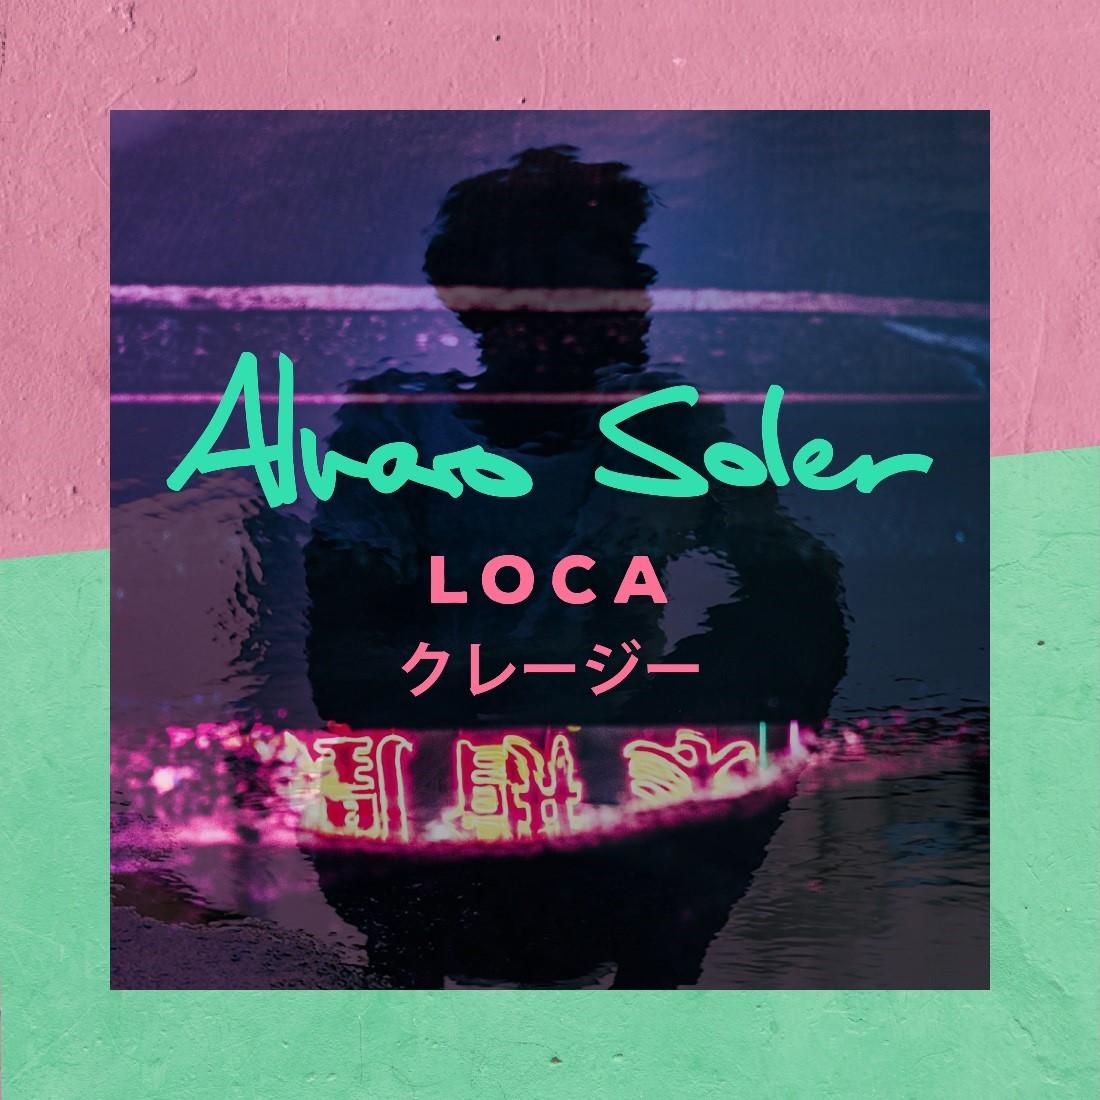 Alvaro Soler Loca single cover